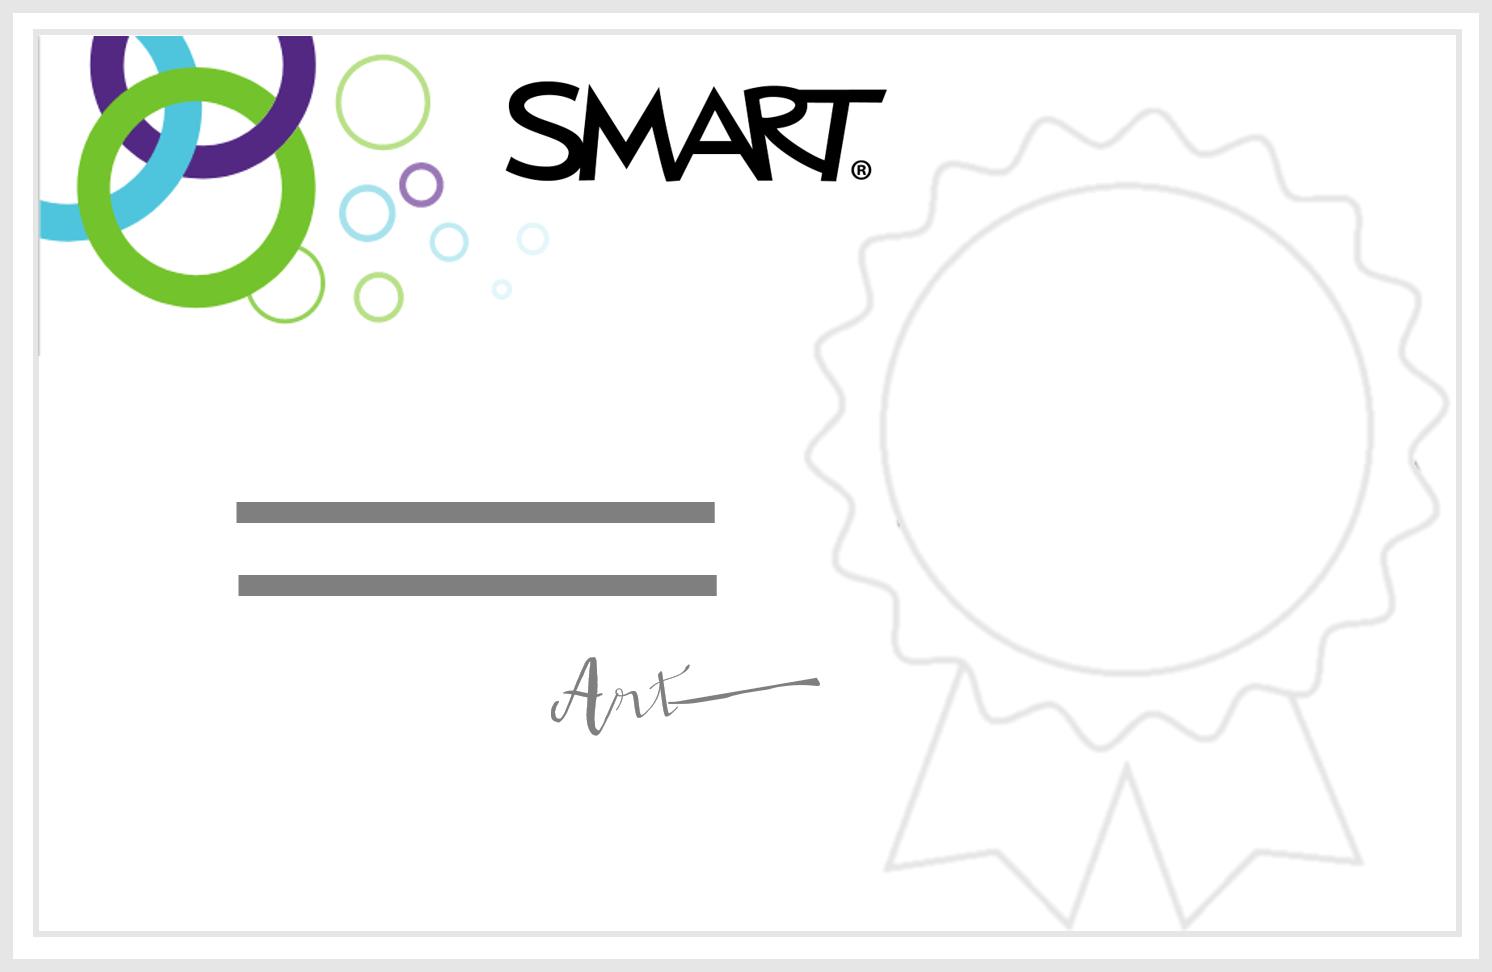 SMART Digital Champion